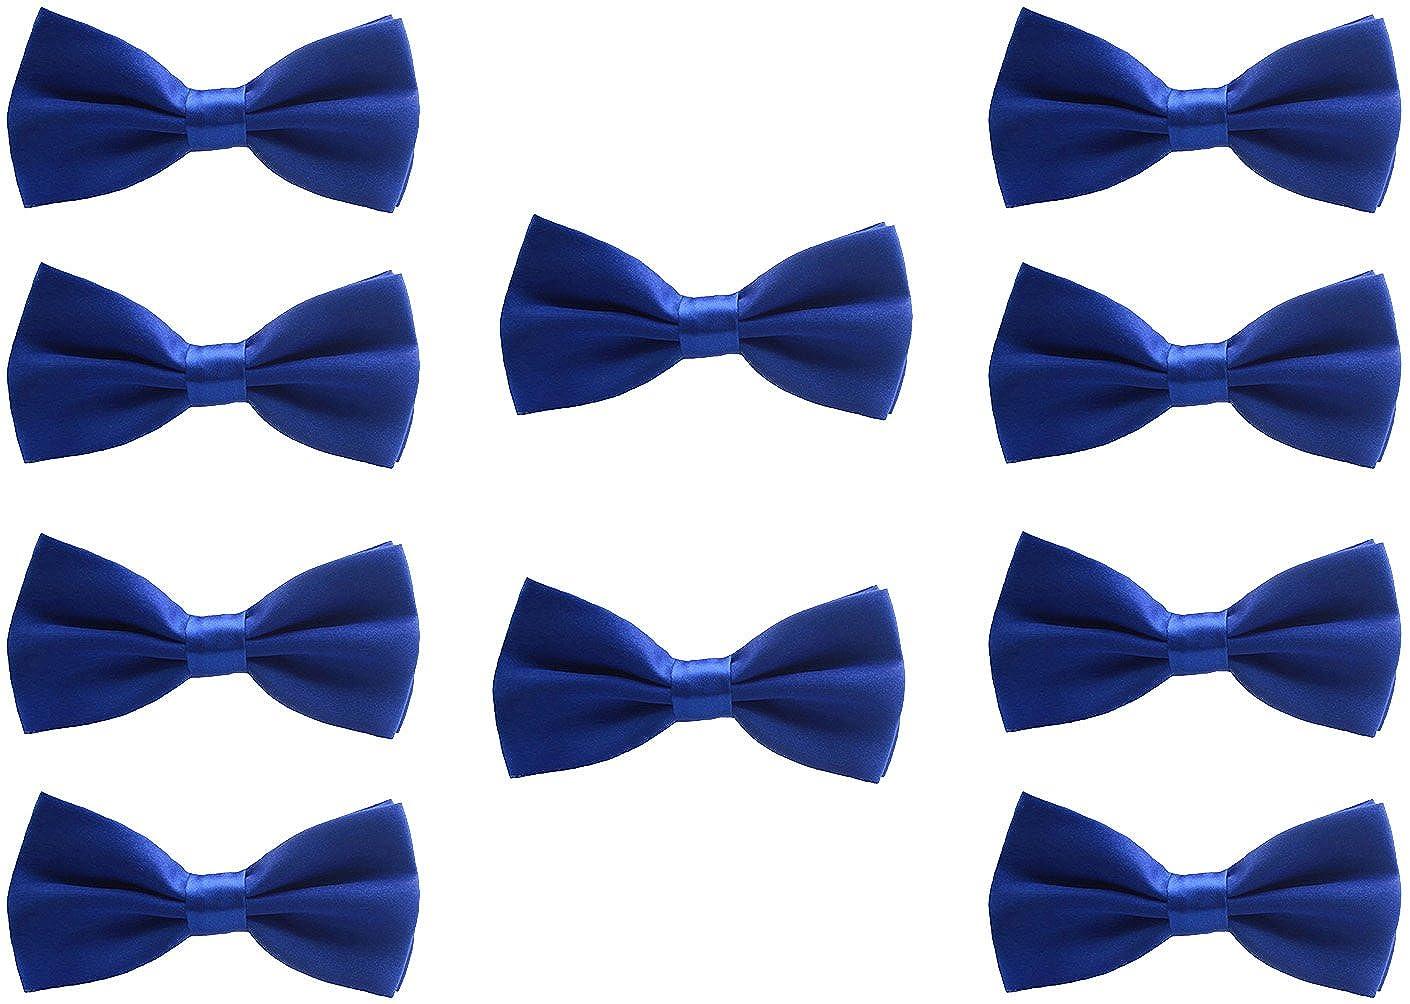 UDRES Men Formal Tuxedo 10 Pack Solid Color Satin Bow Tie Classic Pre-Tied Bowtie Black) tie005black